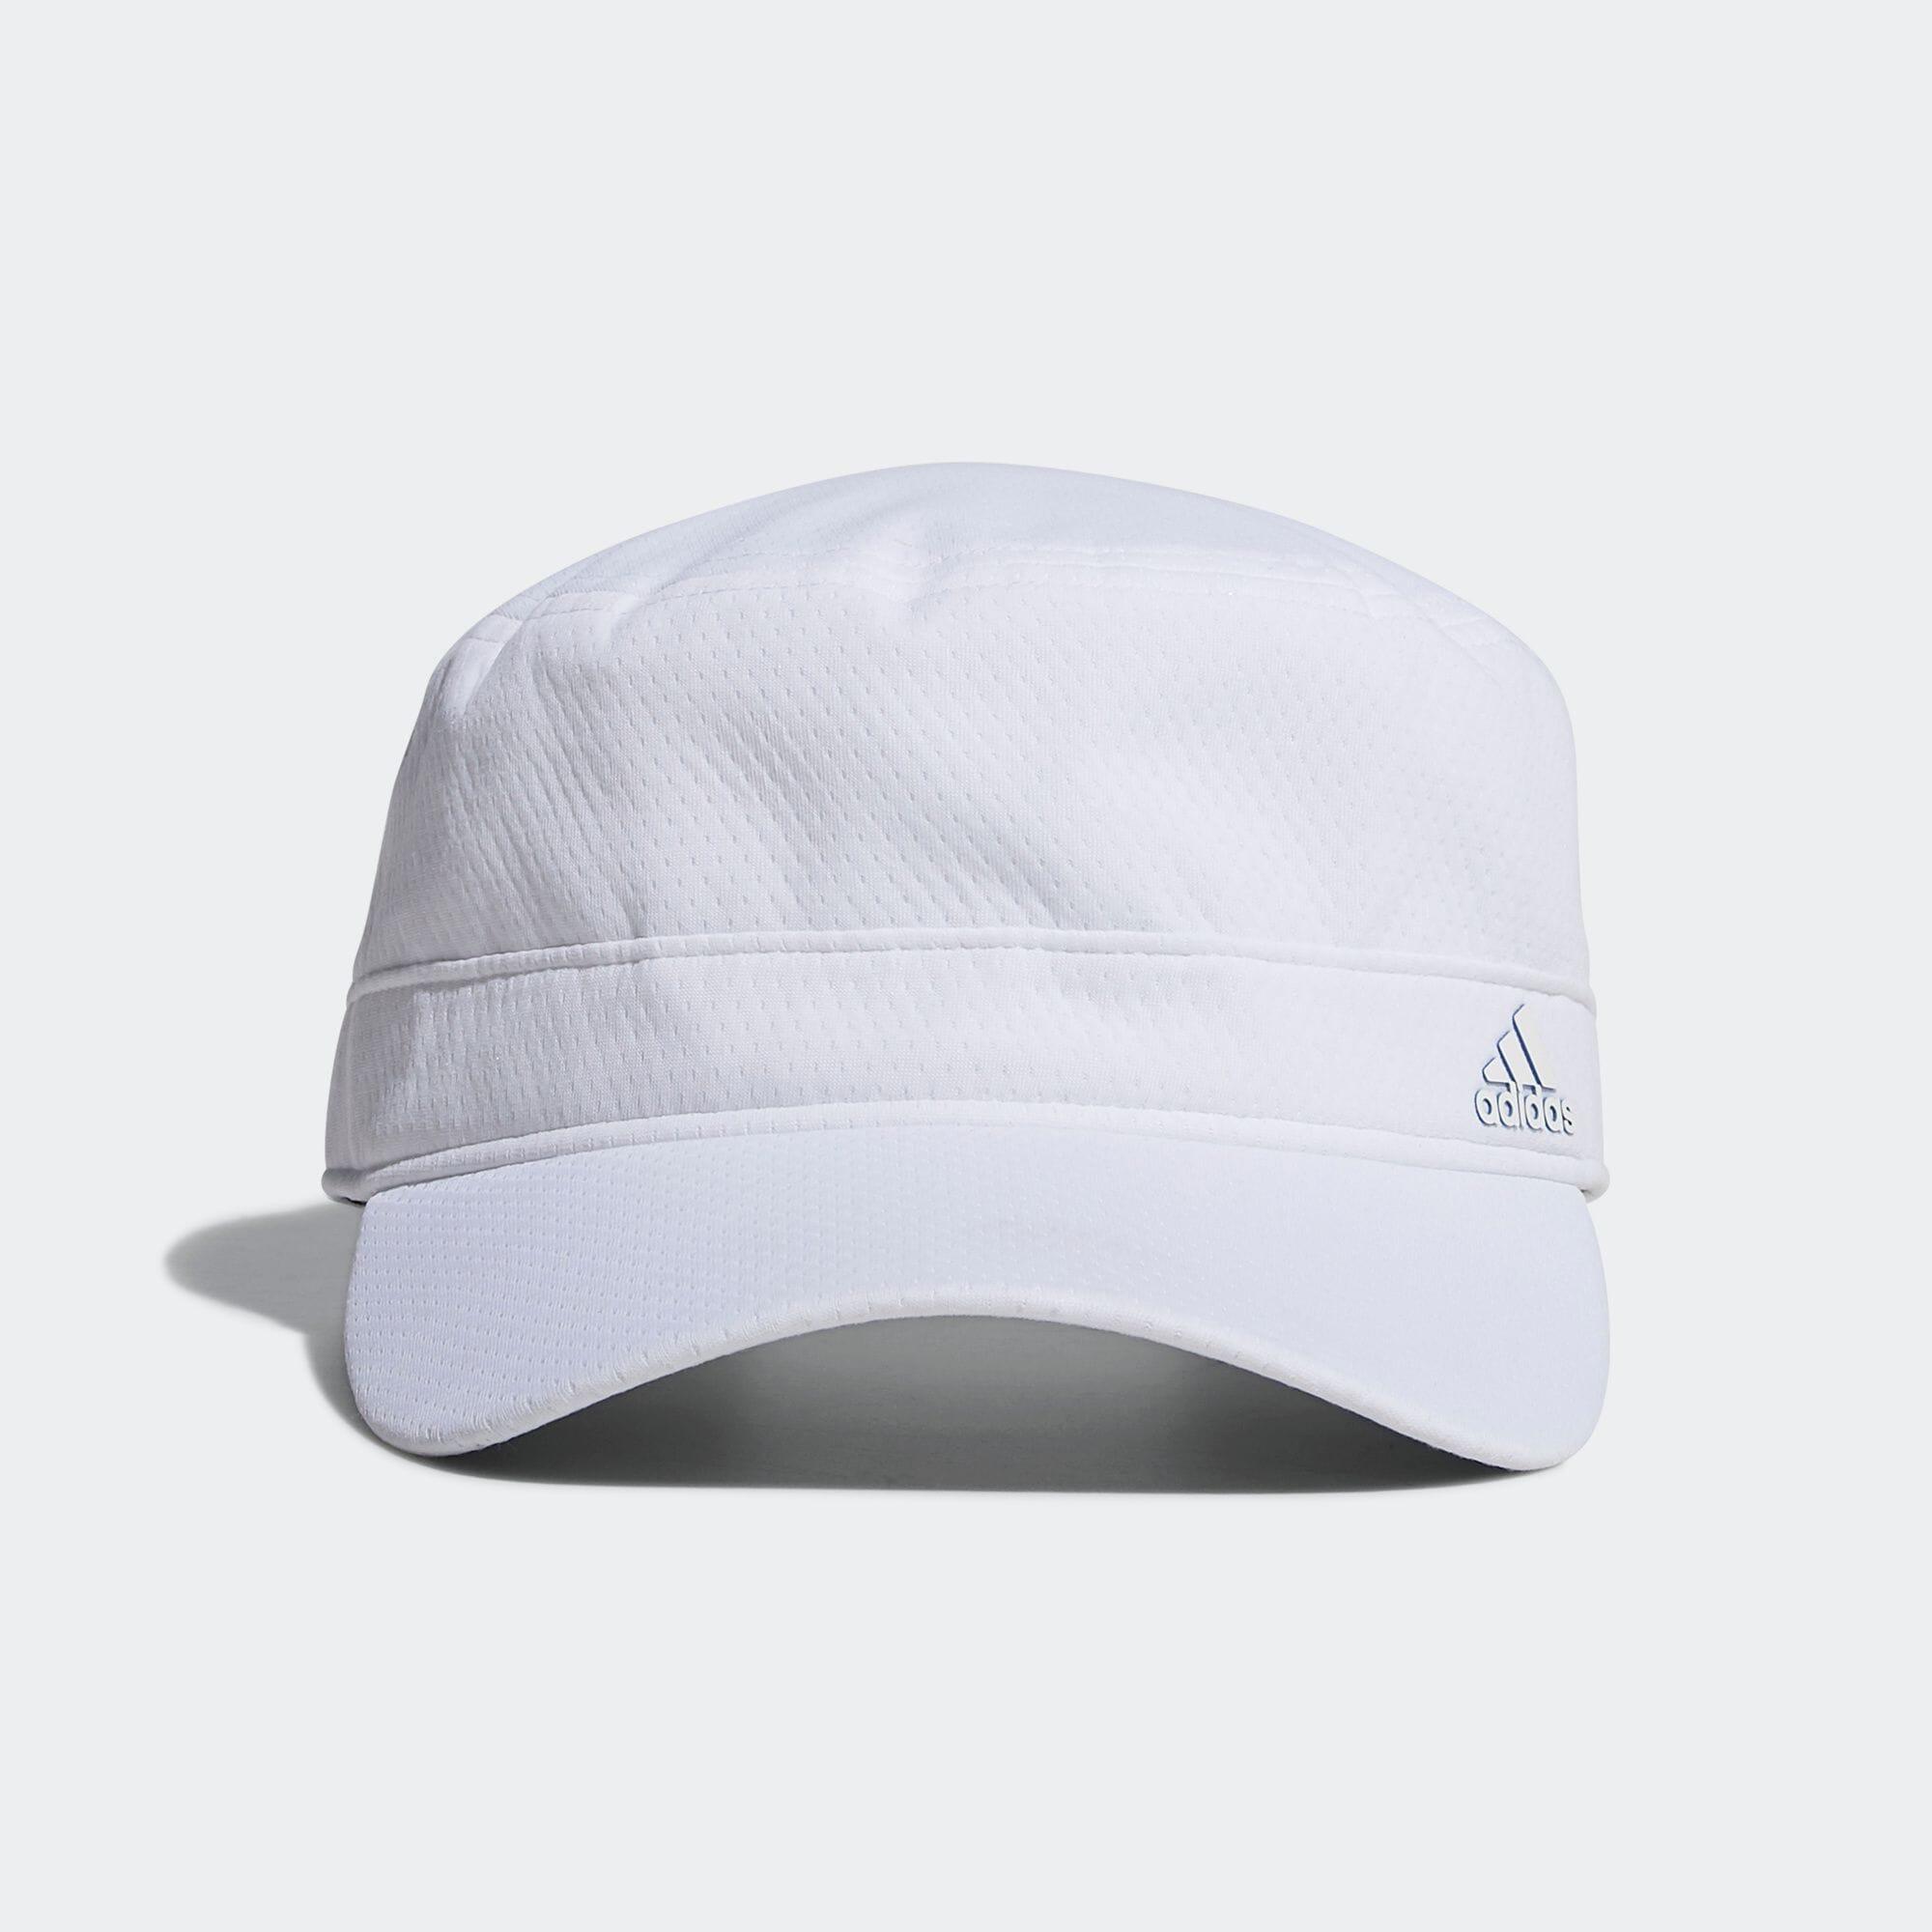 HEATREADY ドゴール【ゴルフ】